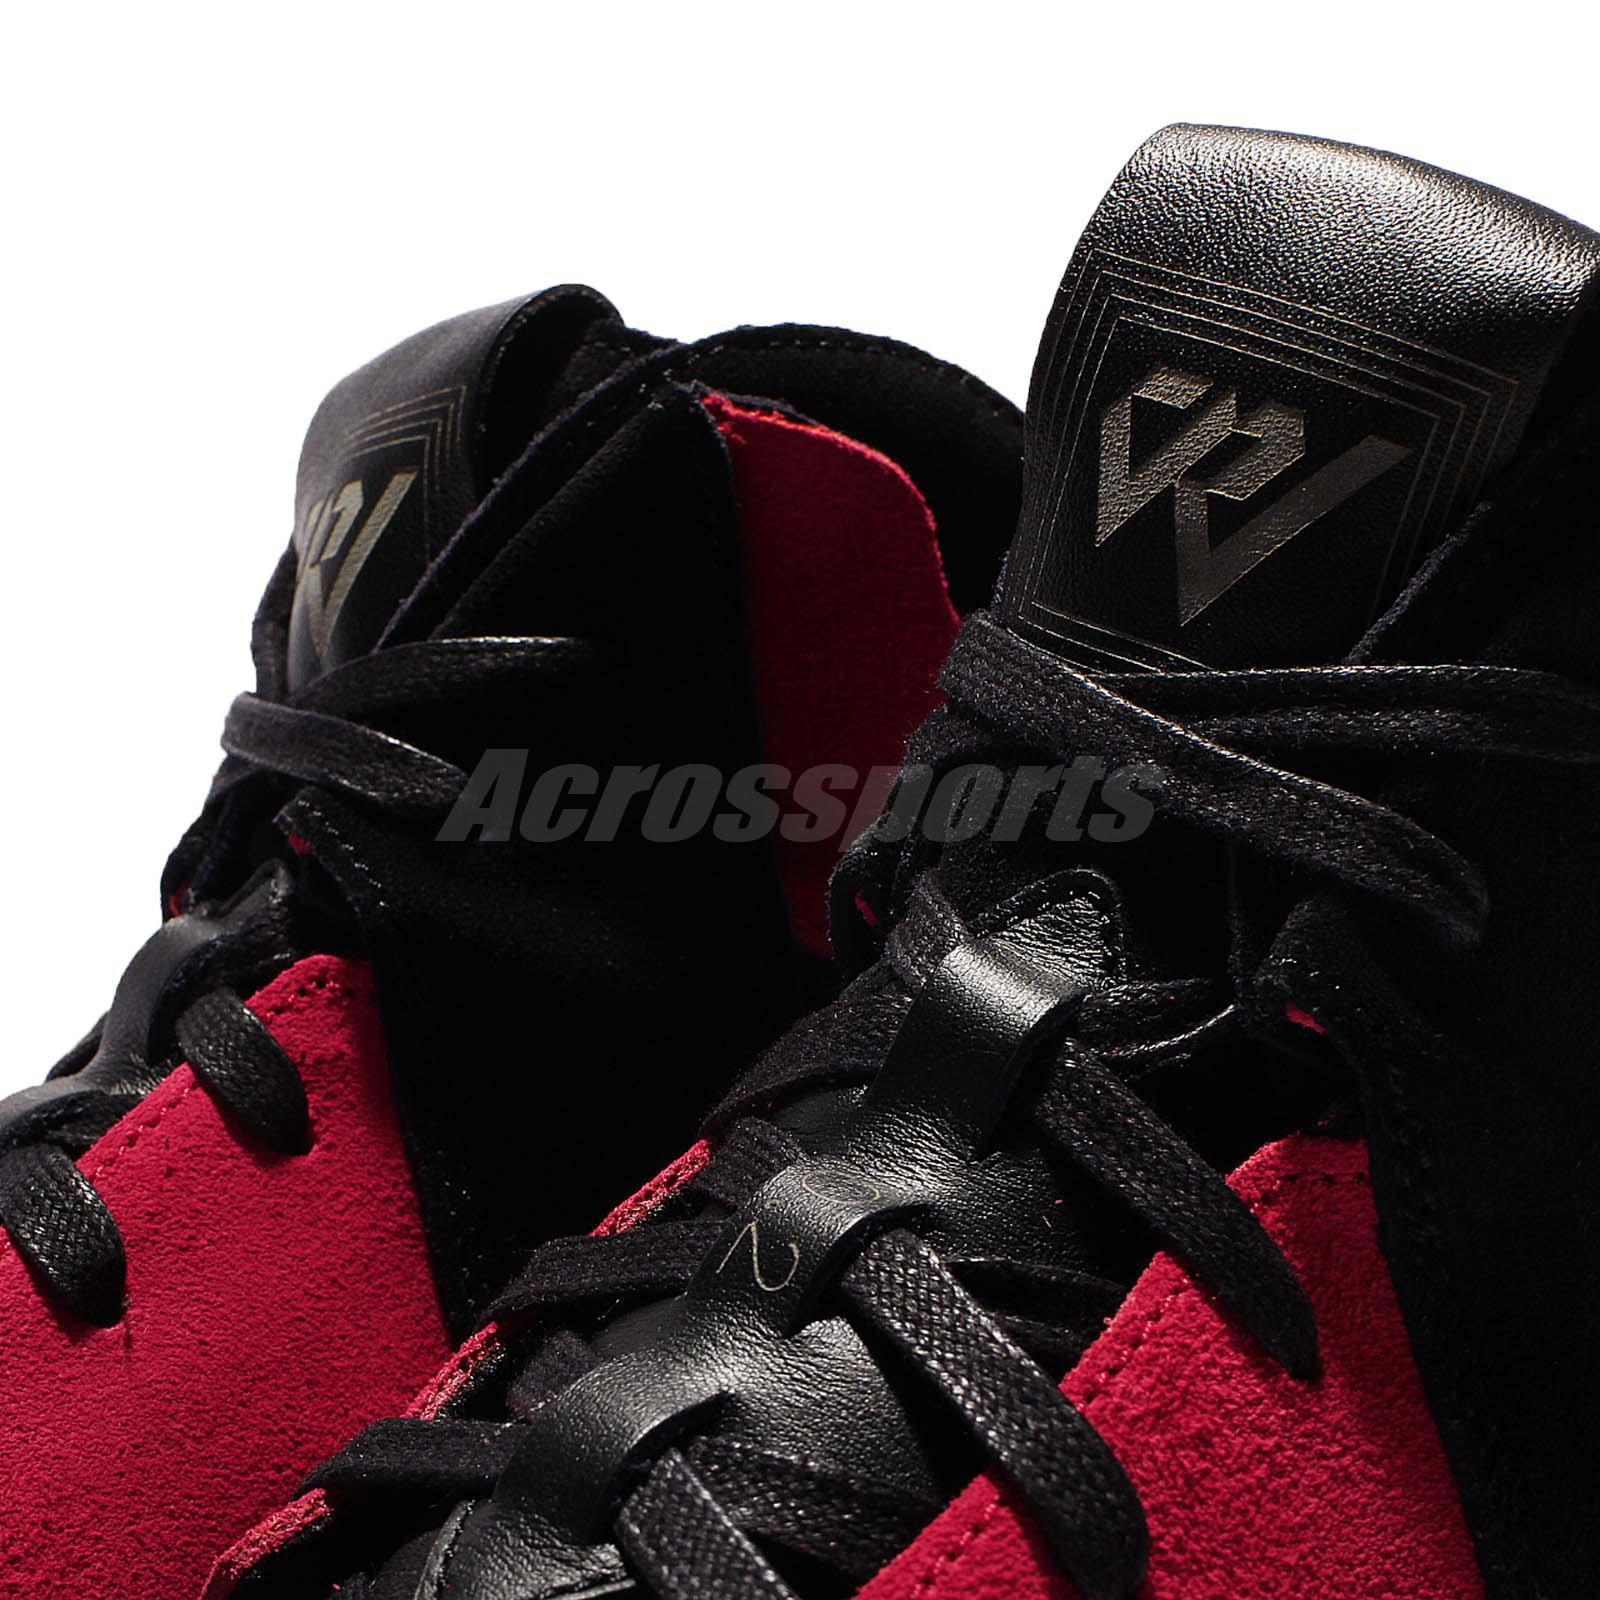 Jordan Westbrook 0.2 Black Red Tongue